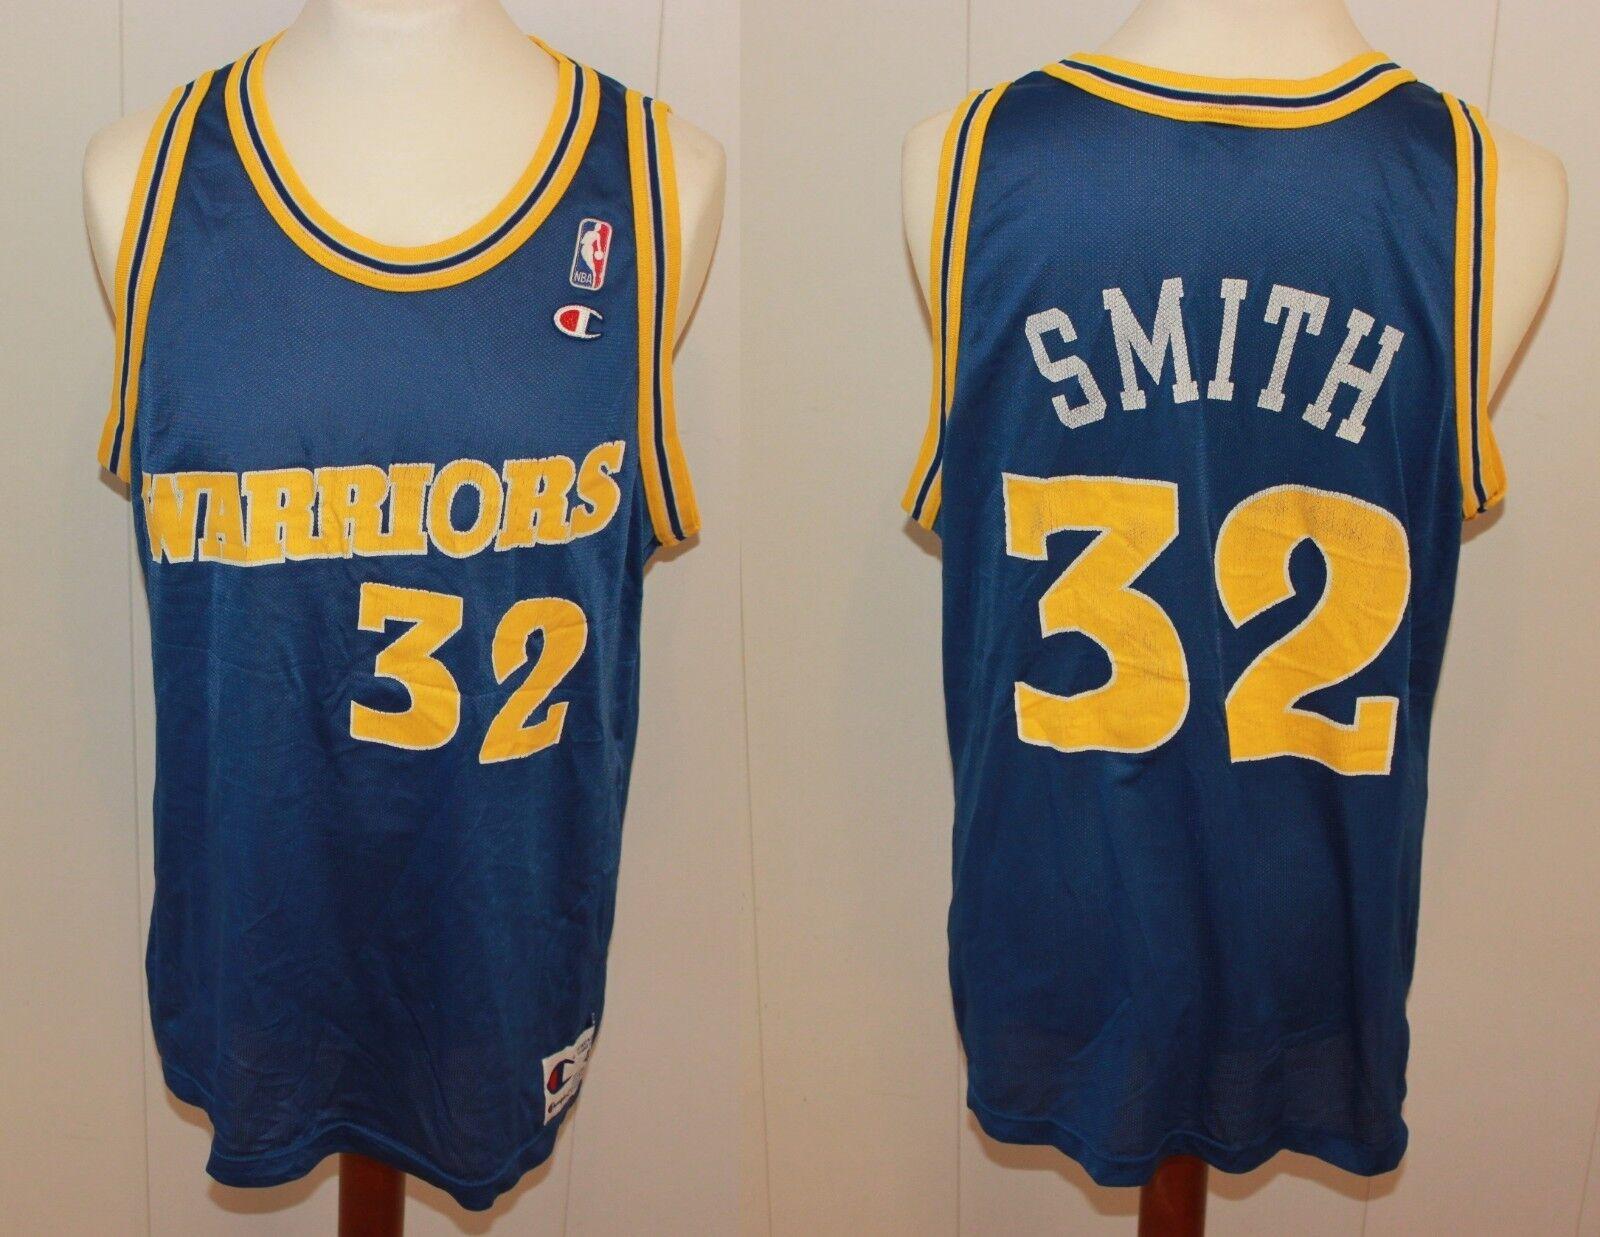 1995-1998 CHAMPION NO 32 JOE SMITH SMITH SMITH GoldEN STATE WARRIORS TRIKOT NBA GR US 48, L e8e9e7